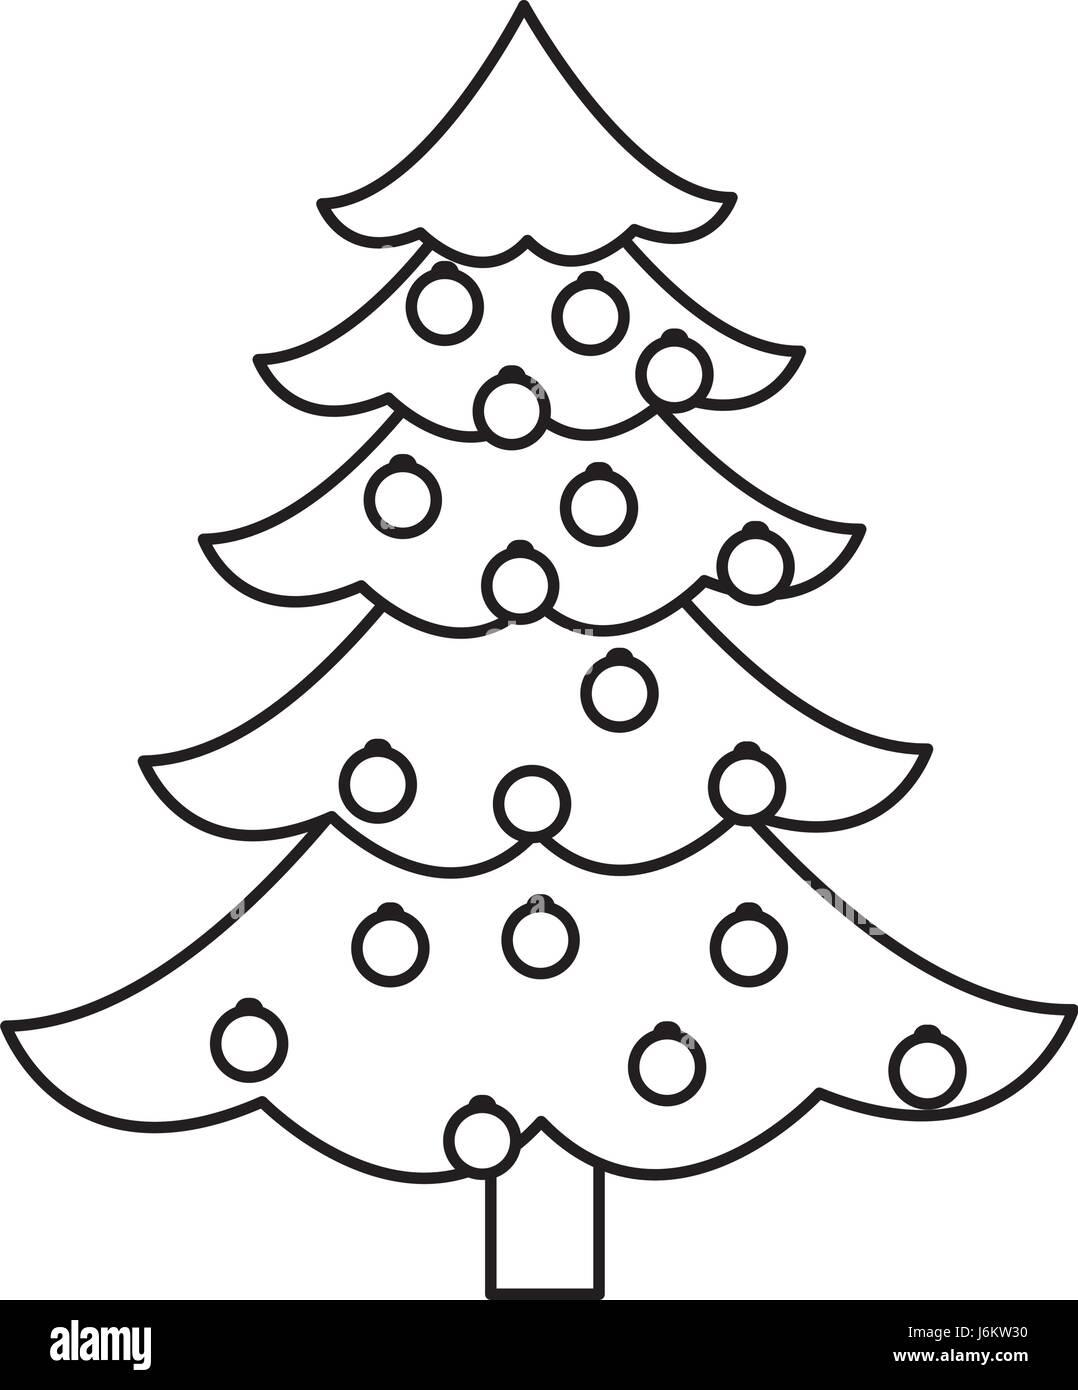 Christmas Tree Pine Decoration Balls Outline Stock Vector